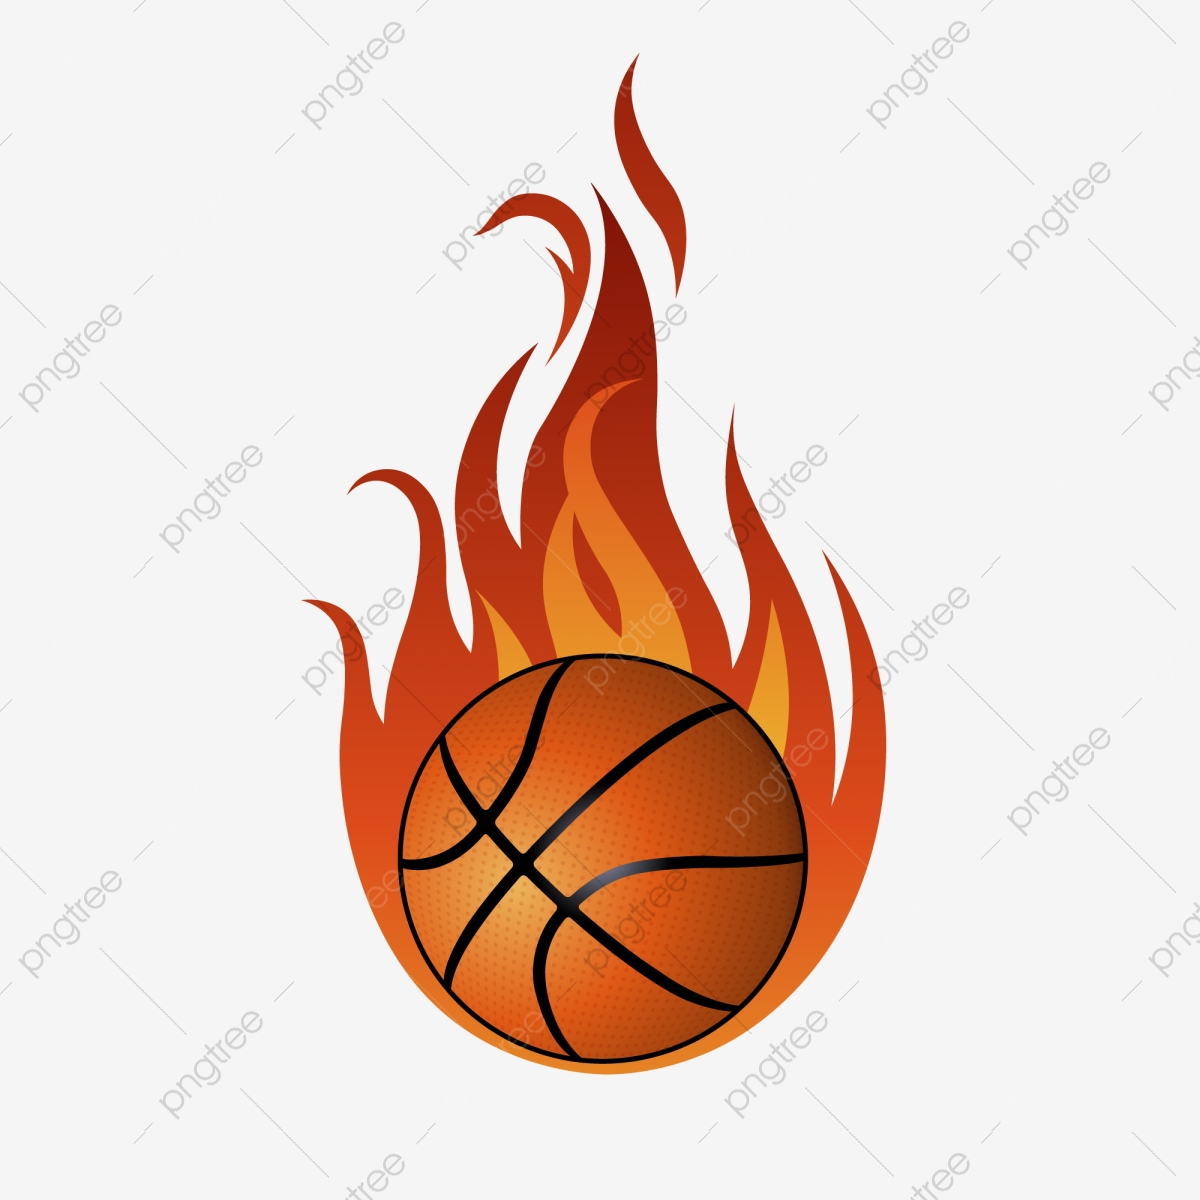 Flame Basketball, Basketball Clipart, Flame Clipart, Flame